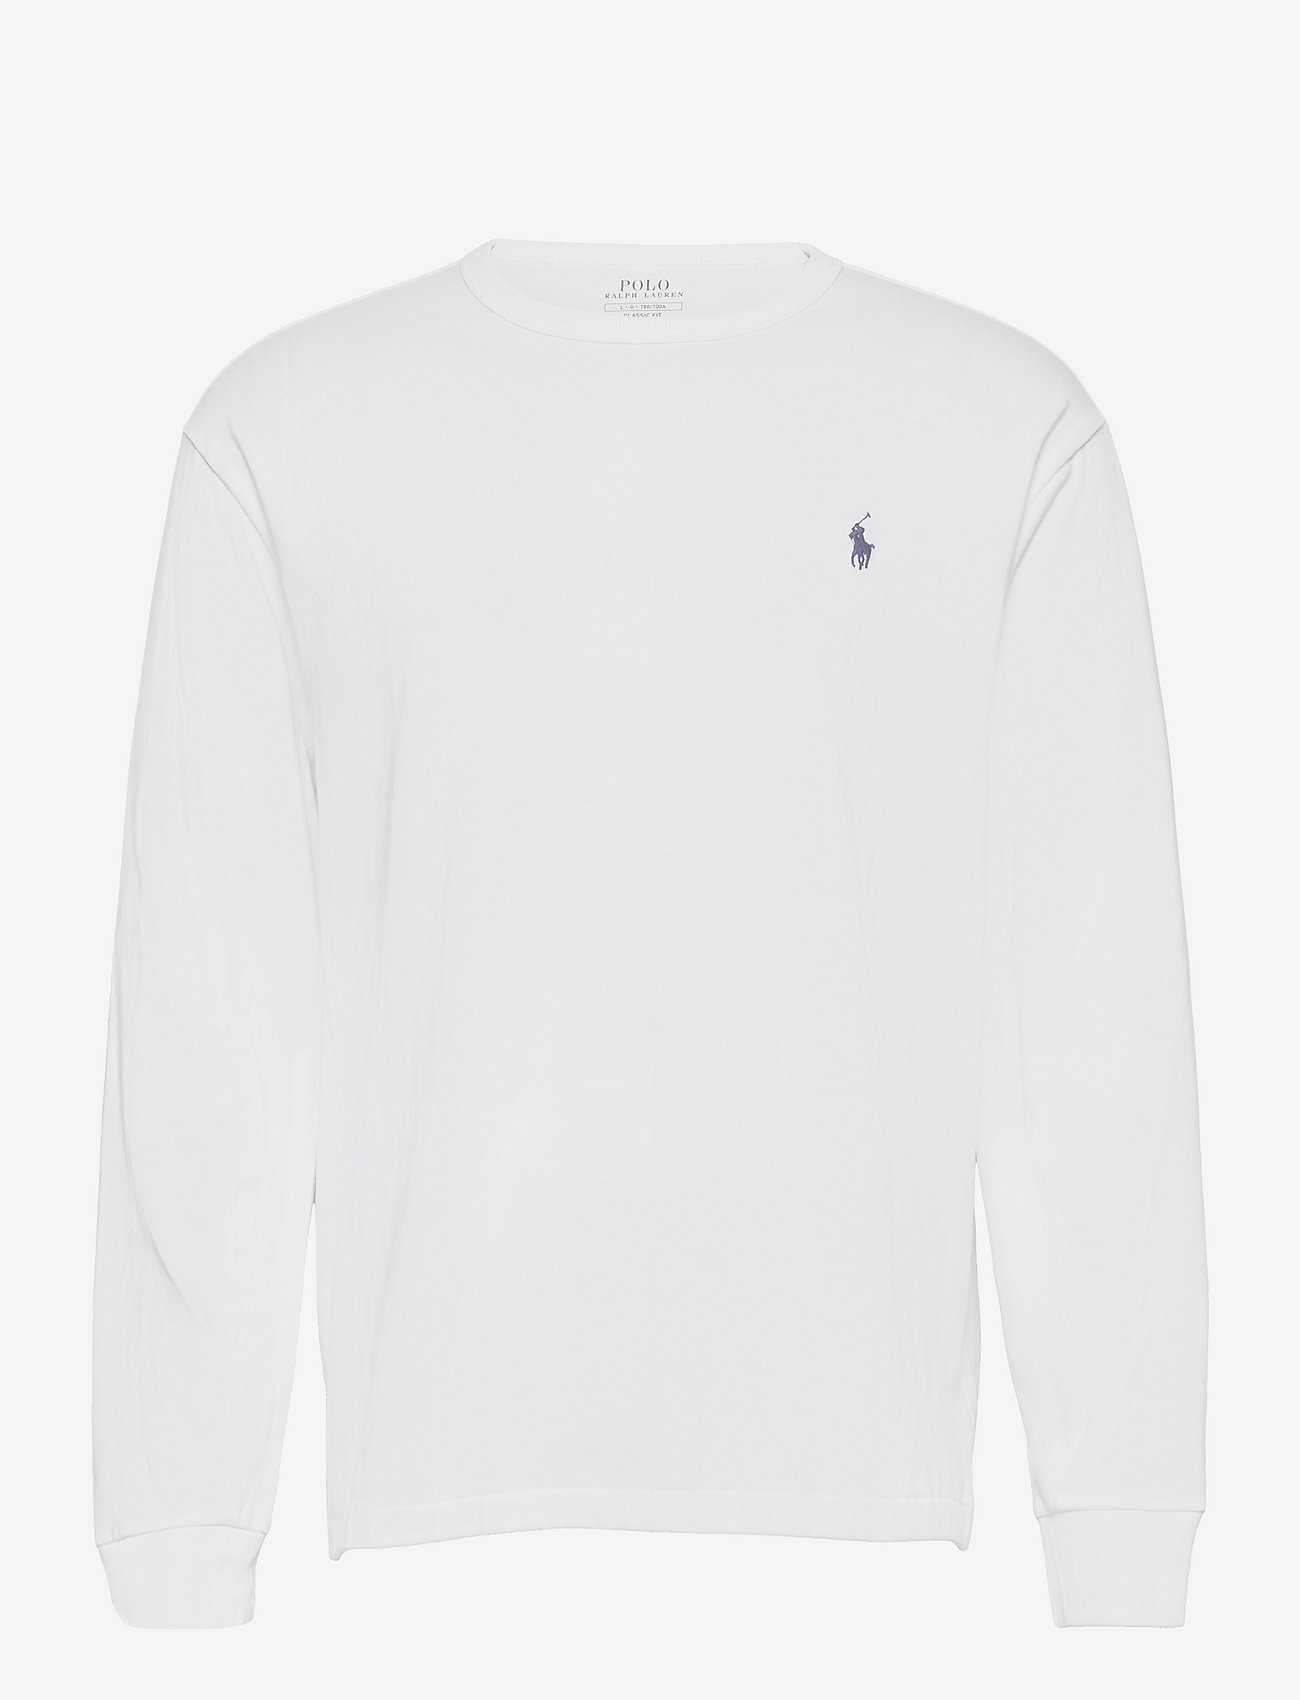 Polo Ralph Lauren - Classic Fit Jersey Long-Sleeve T-Shirt - basic t-shirts - white/c7996 - 0